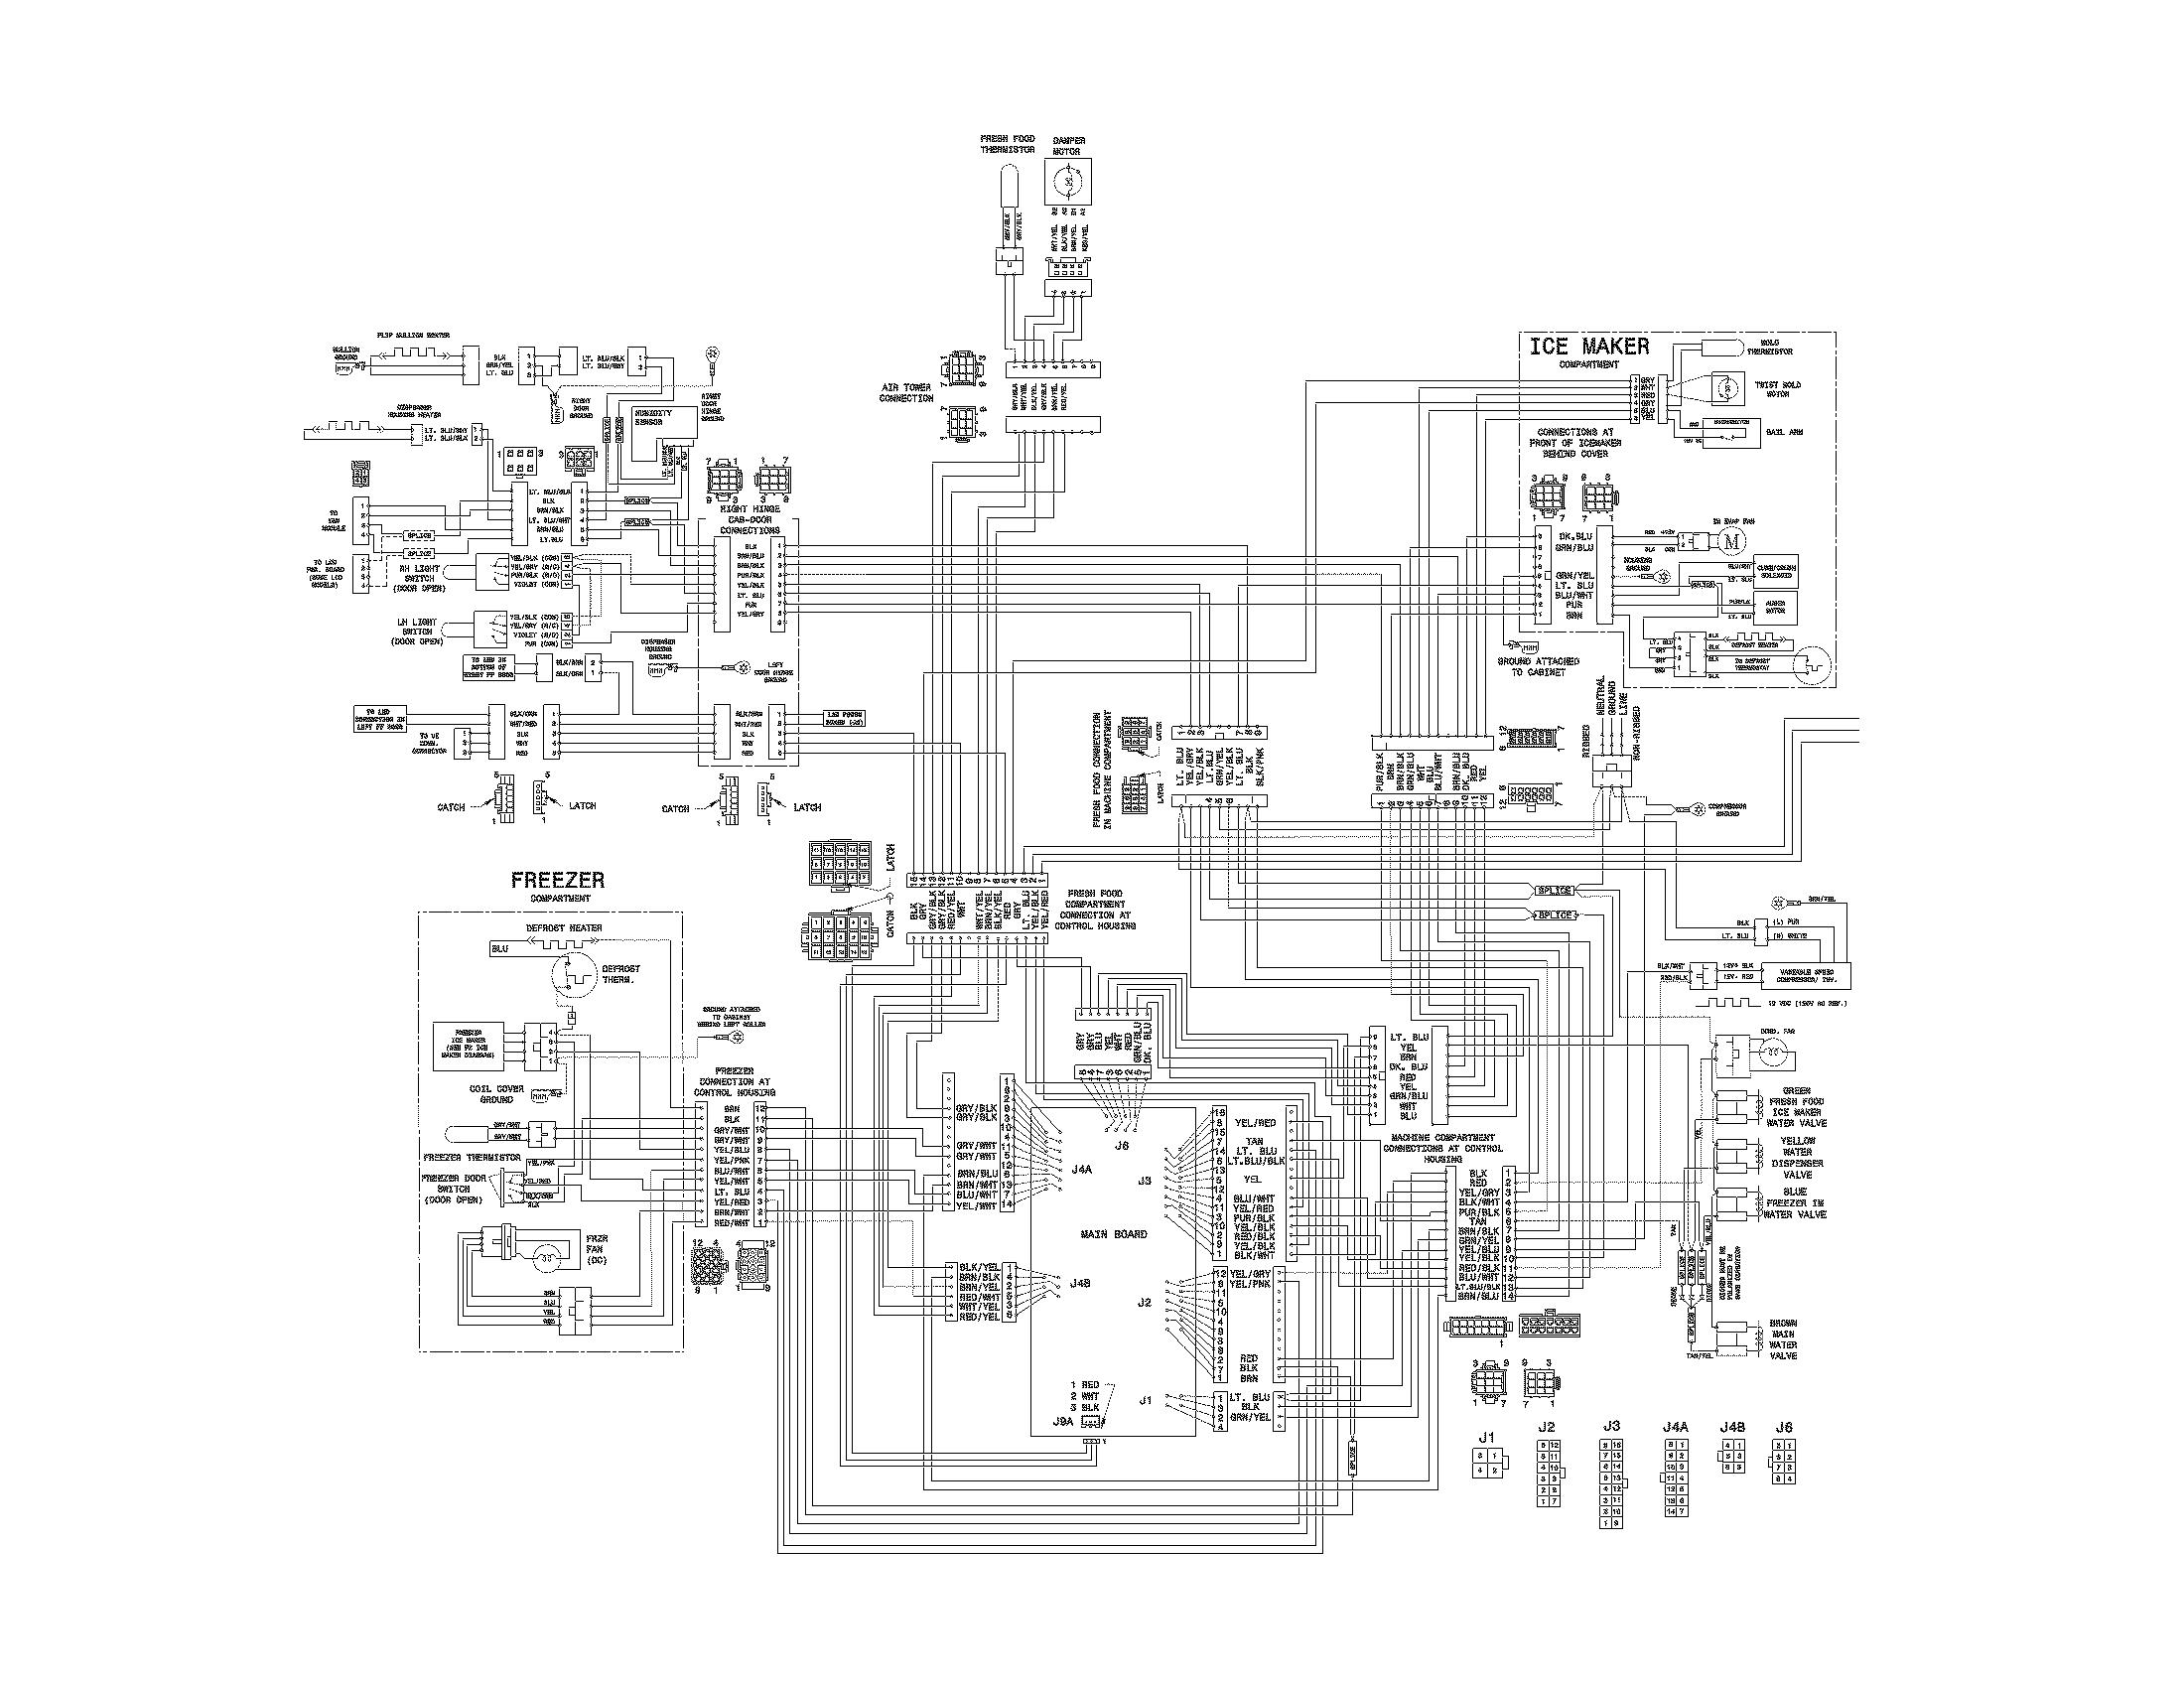 ELECTROLUX REFRIGERATOR Parts   Model EI23BC35KS4   Sears